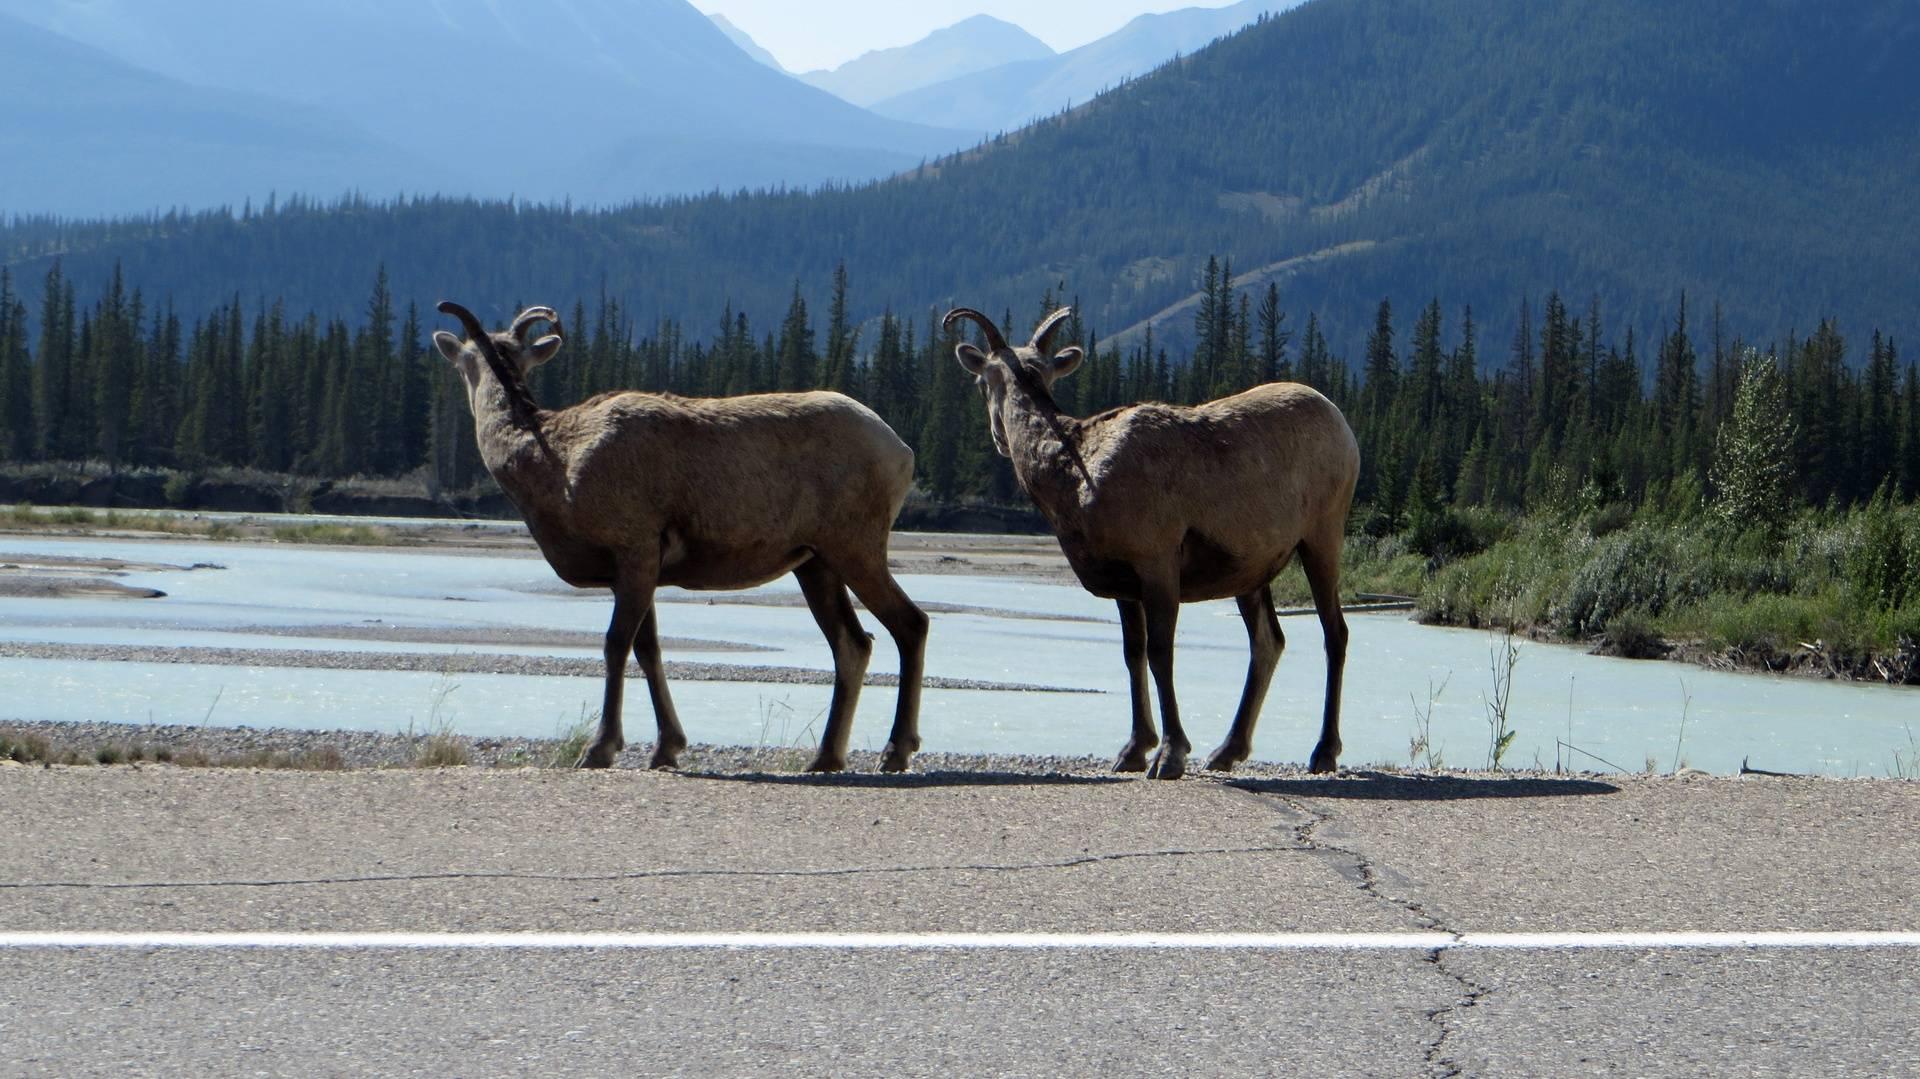 Deer on road from Jasper to Edmonton